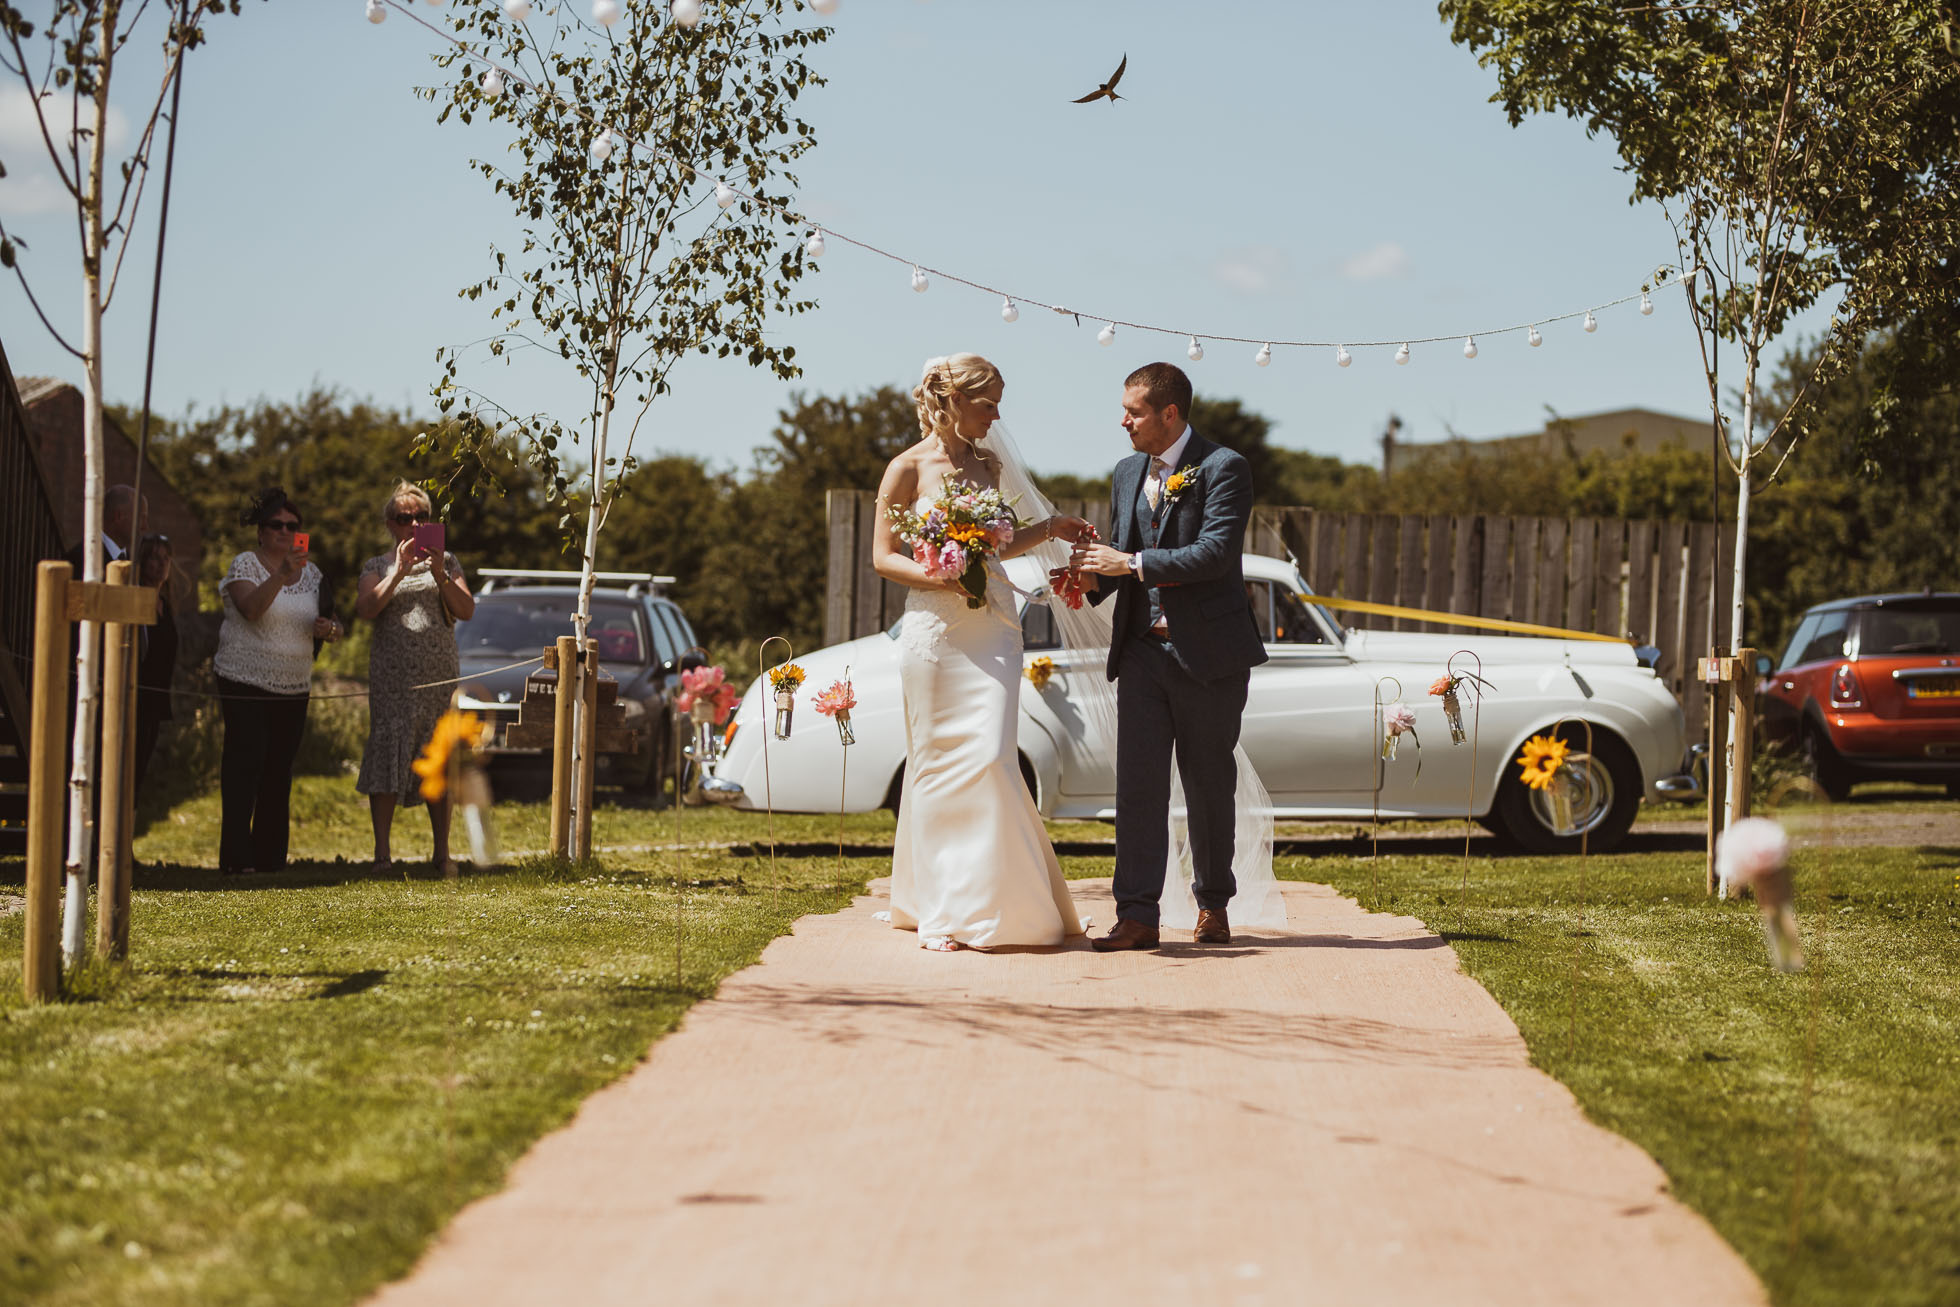 the_barn_scarborough_wedding_photographer-35.jpg